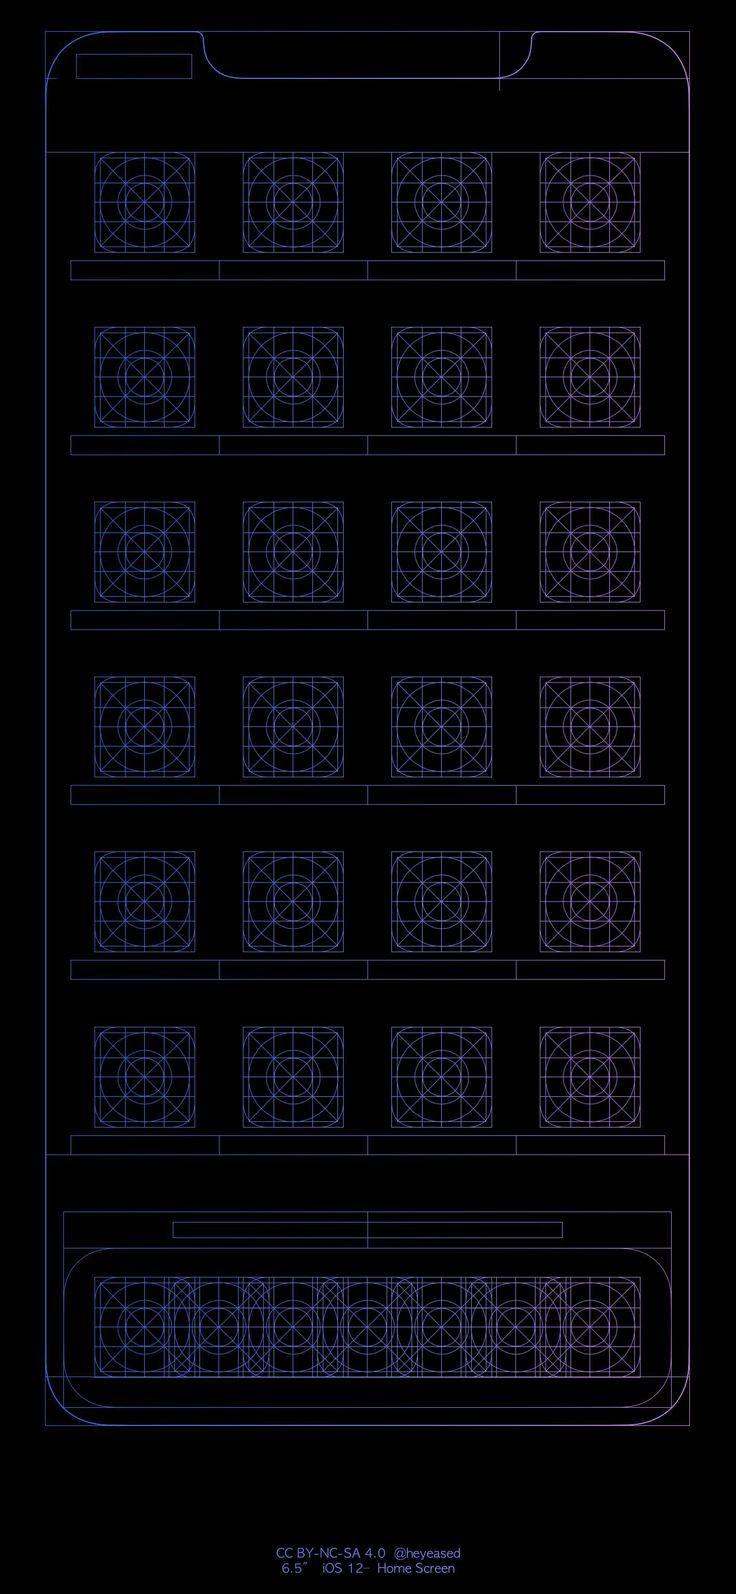 Blueprint for XS Max via heyeased в 2020 г Обои для